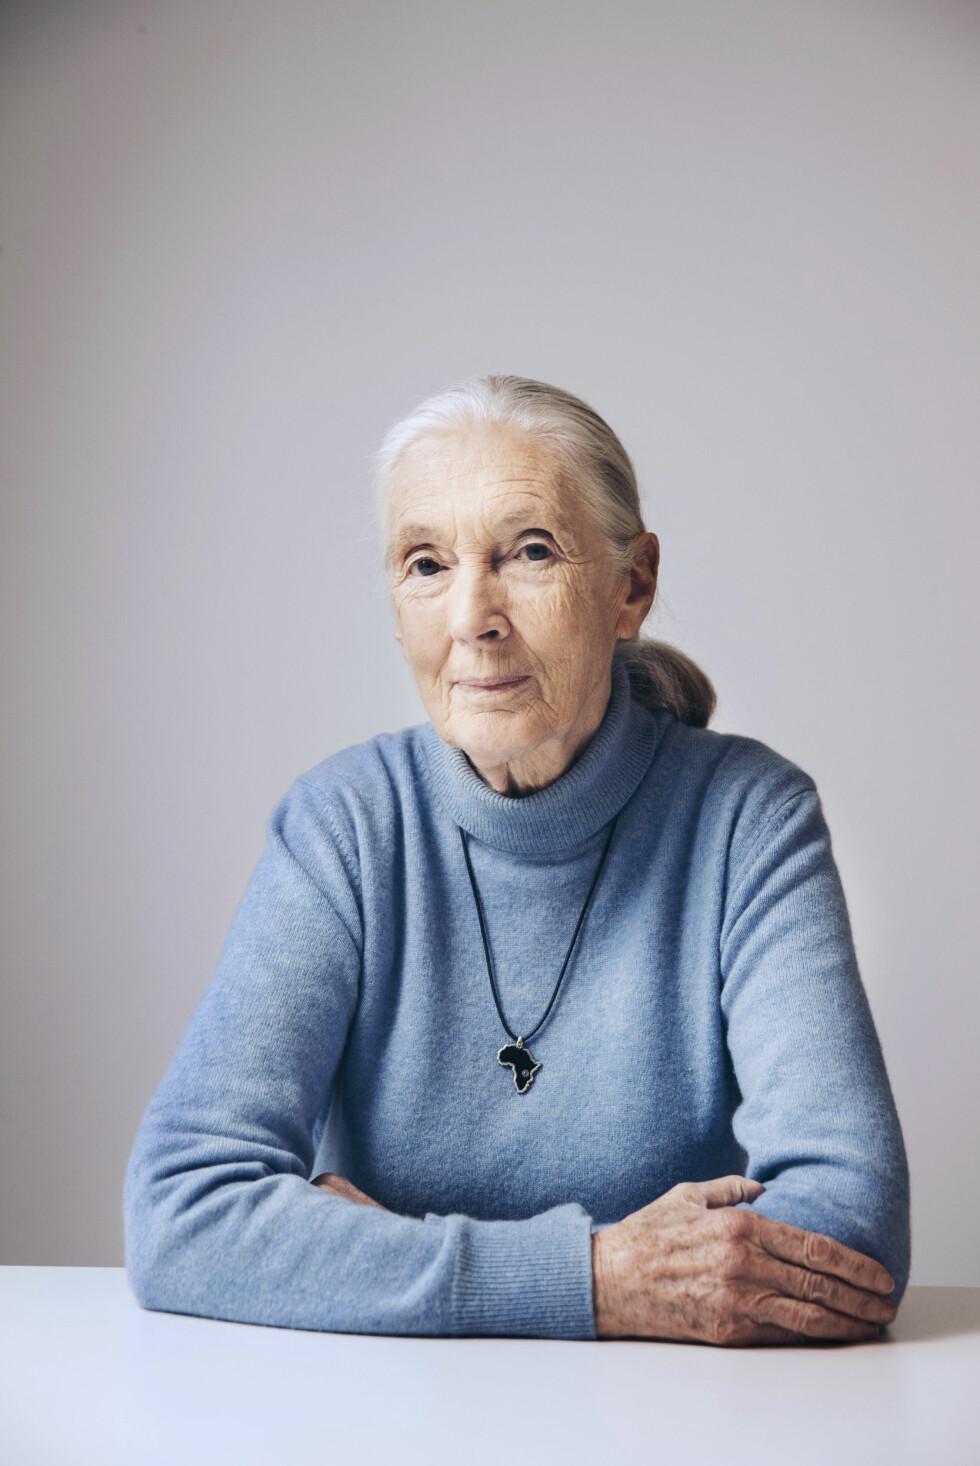 I DAG: Det er ingen tvil om at den flotte antropologen holder seg godt. 3. april fyller Jane Goodall 84 år. Foto: NTB Scanpix